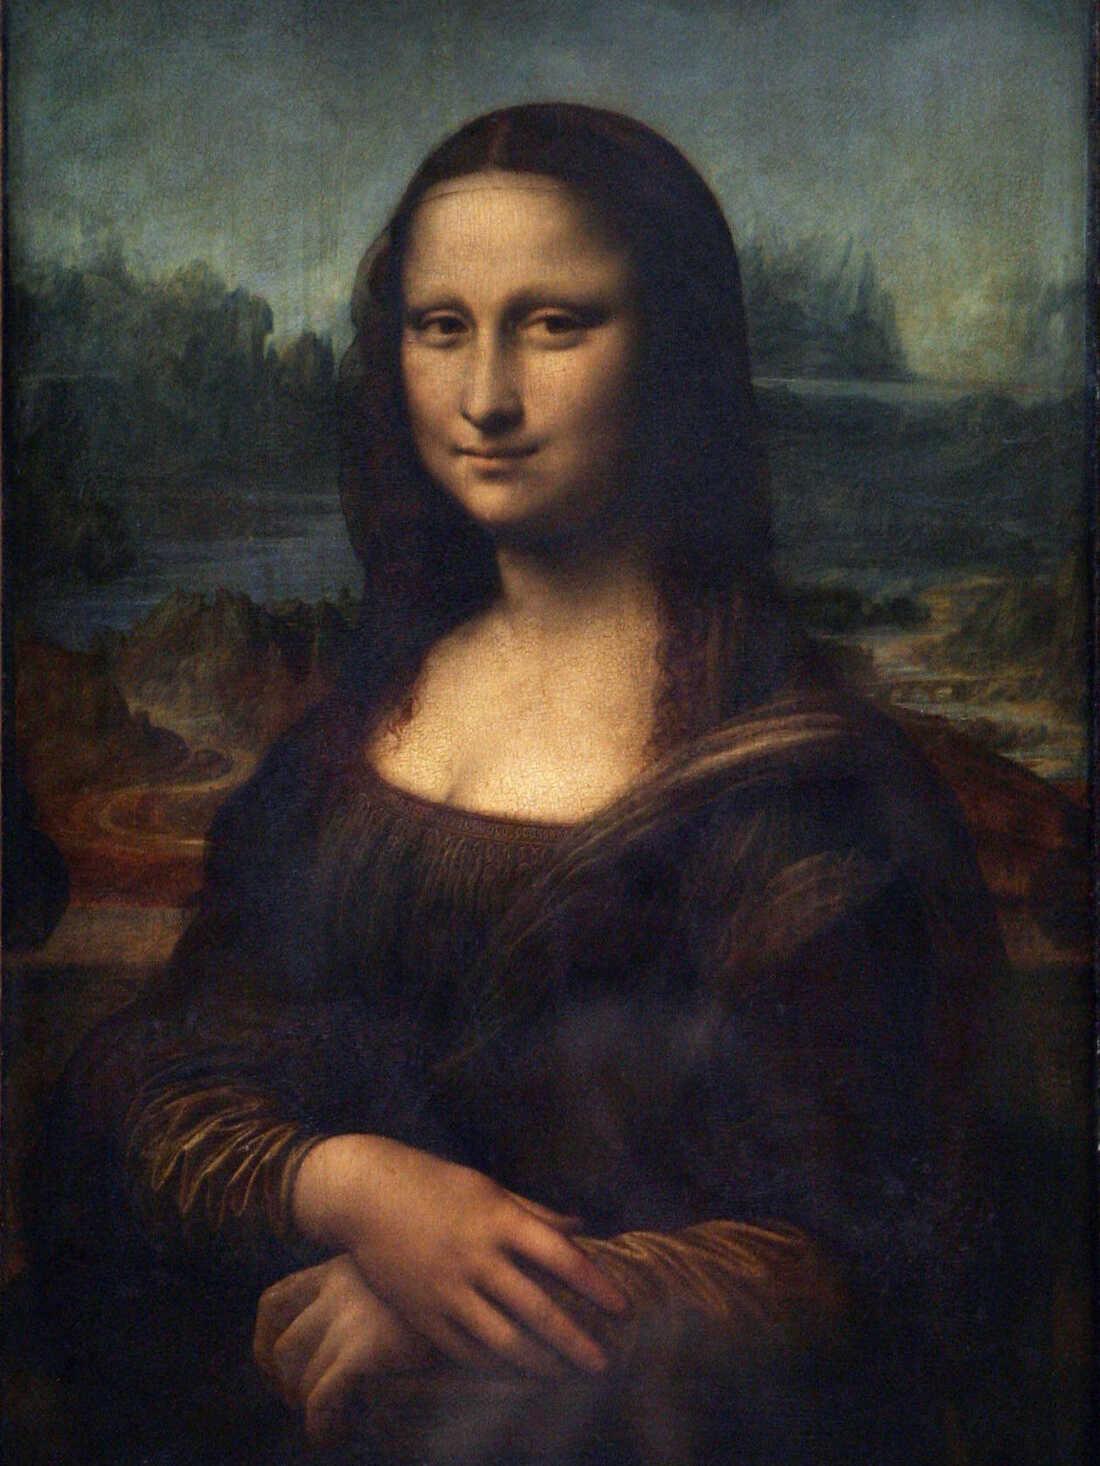 The Mona Lisa by Italian artist Leonardo da Vinci, at the Louvre museum in Paris.